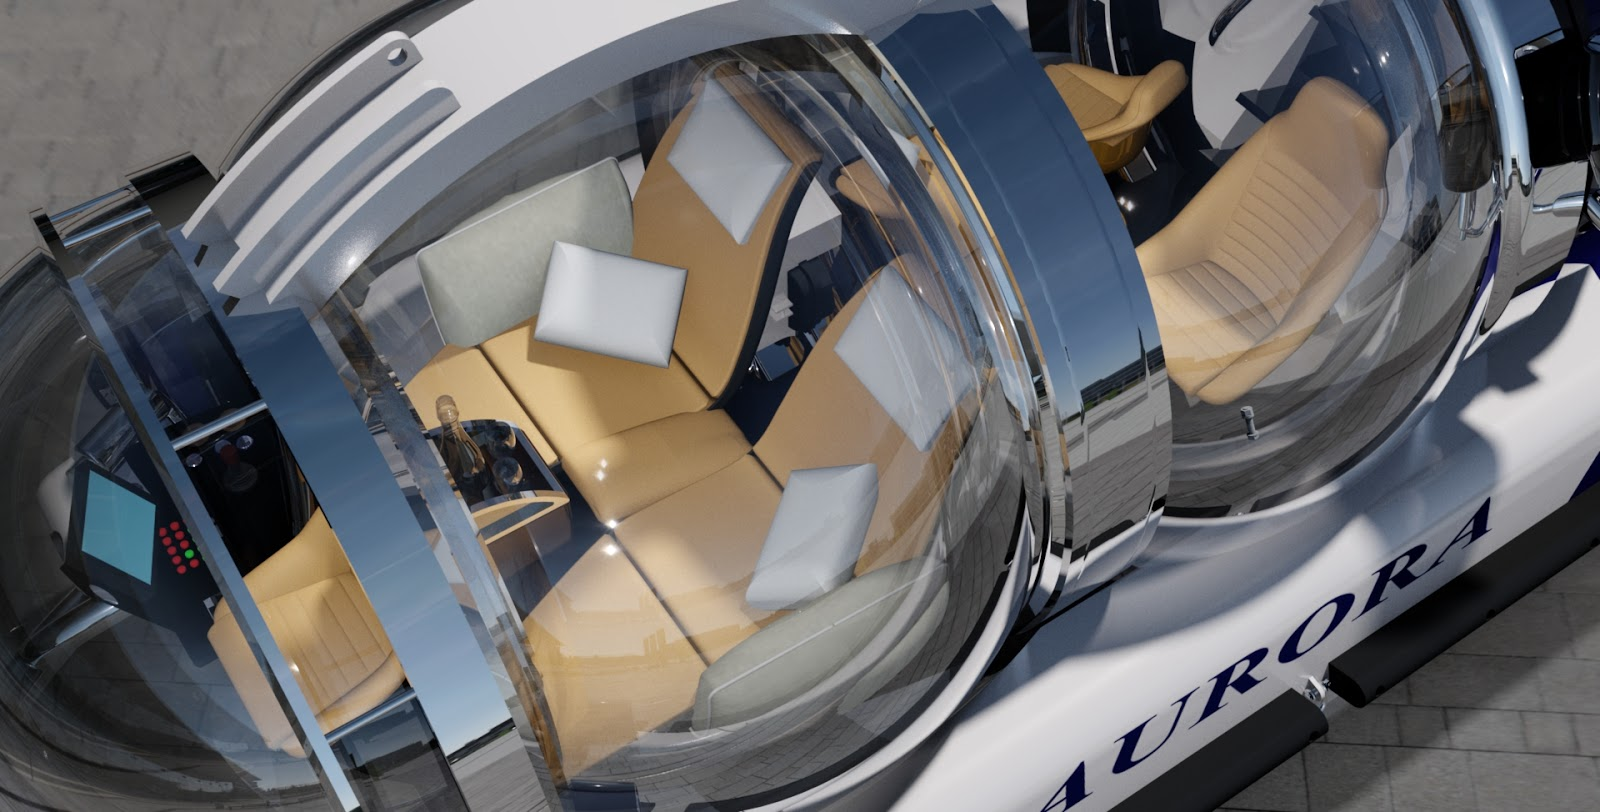 Seamagine Small Personal Submarines And Deep Sea